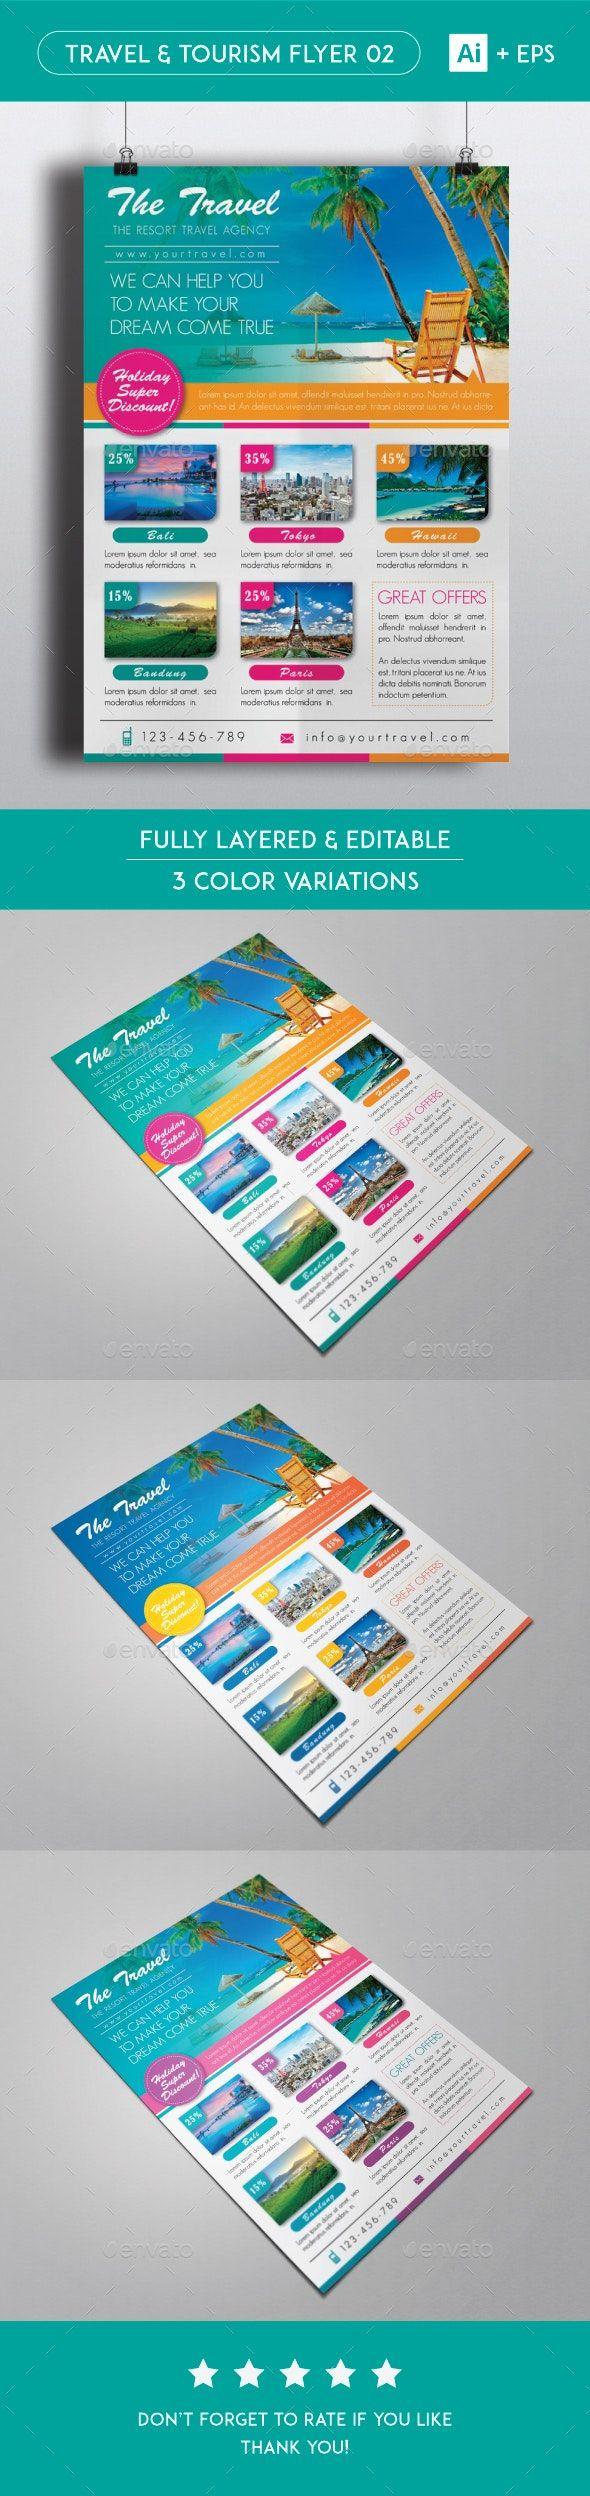 Travel amp Tourism Flyer 02